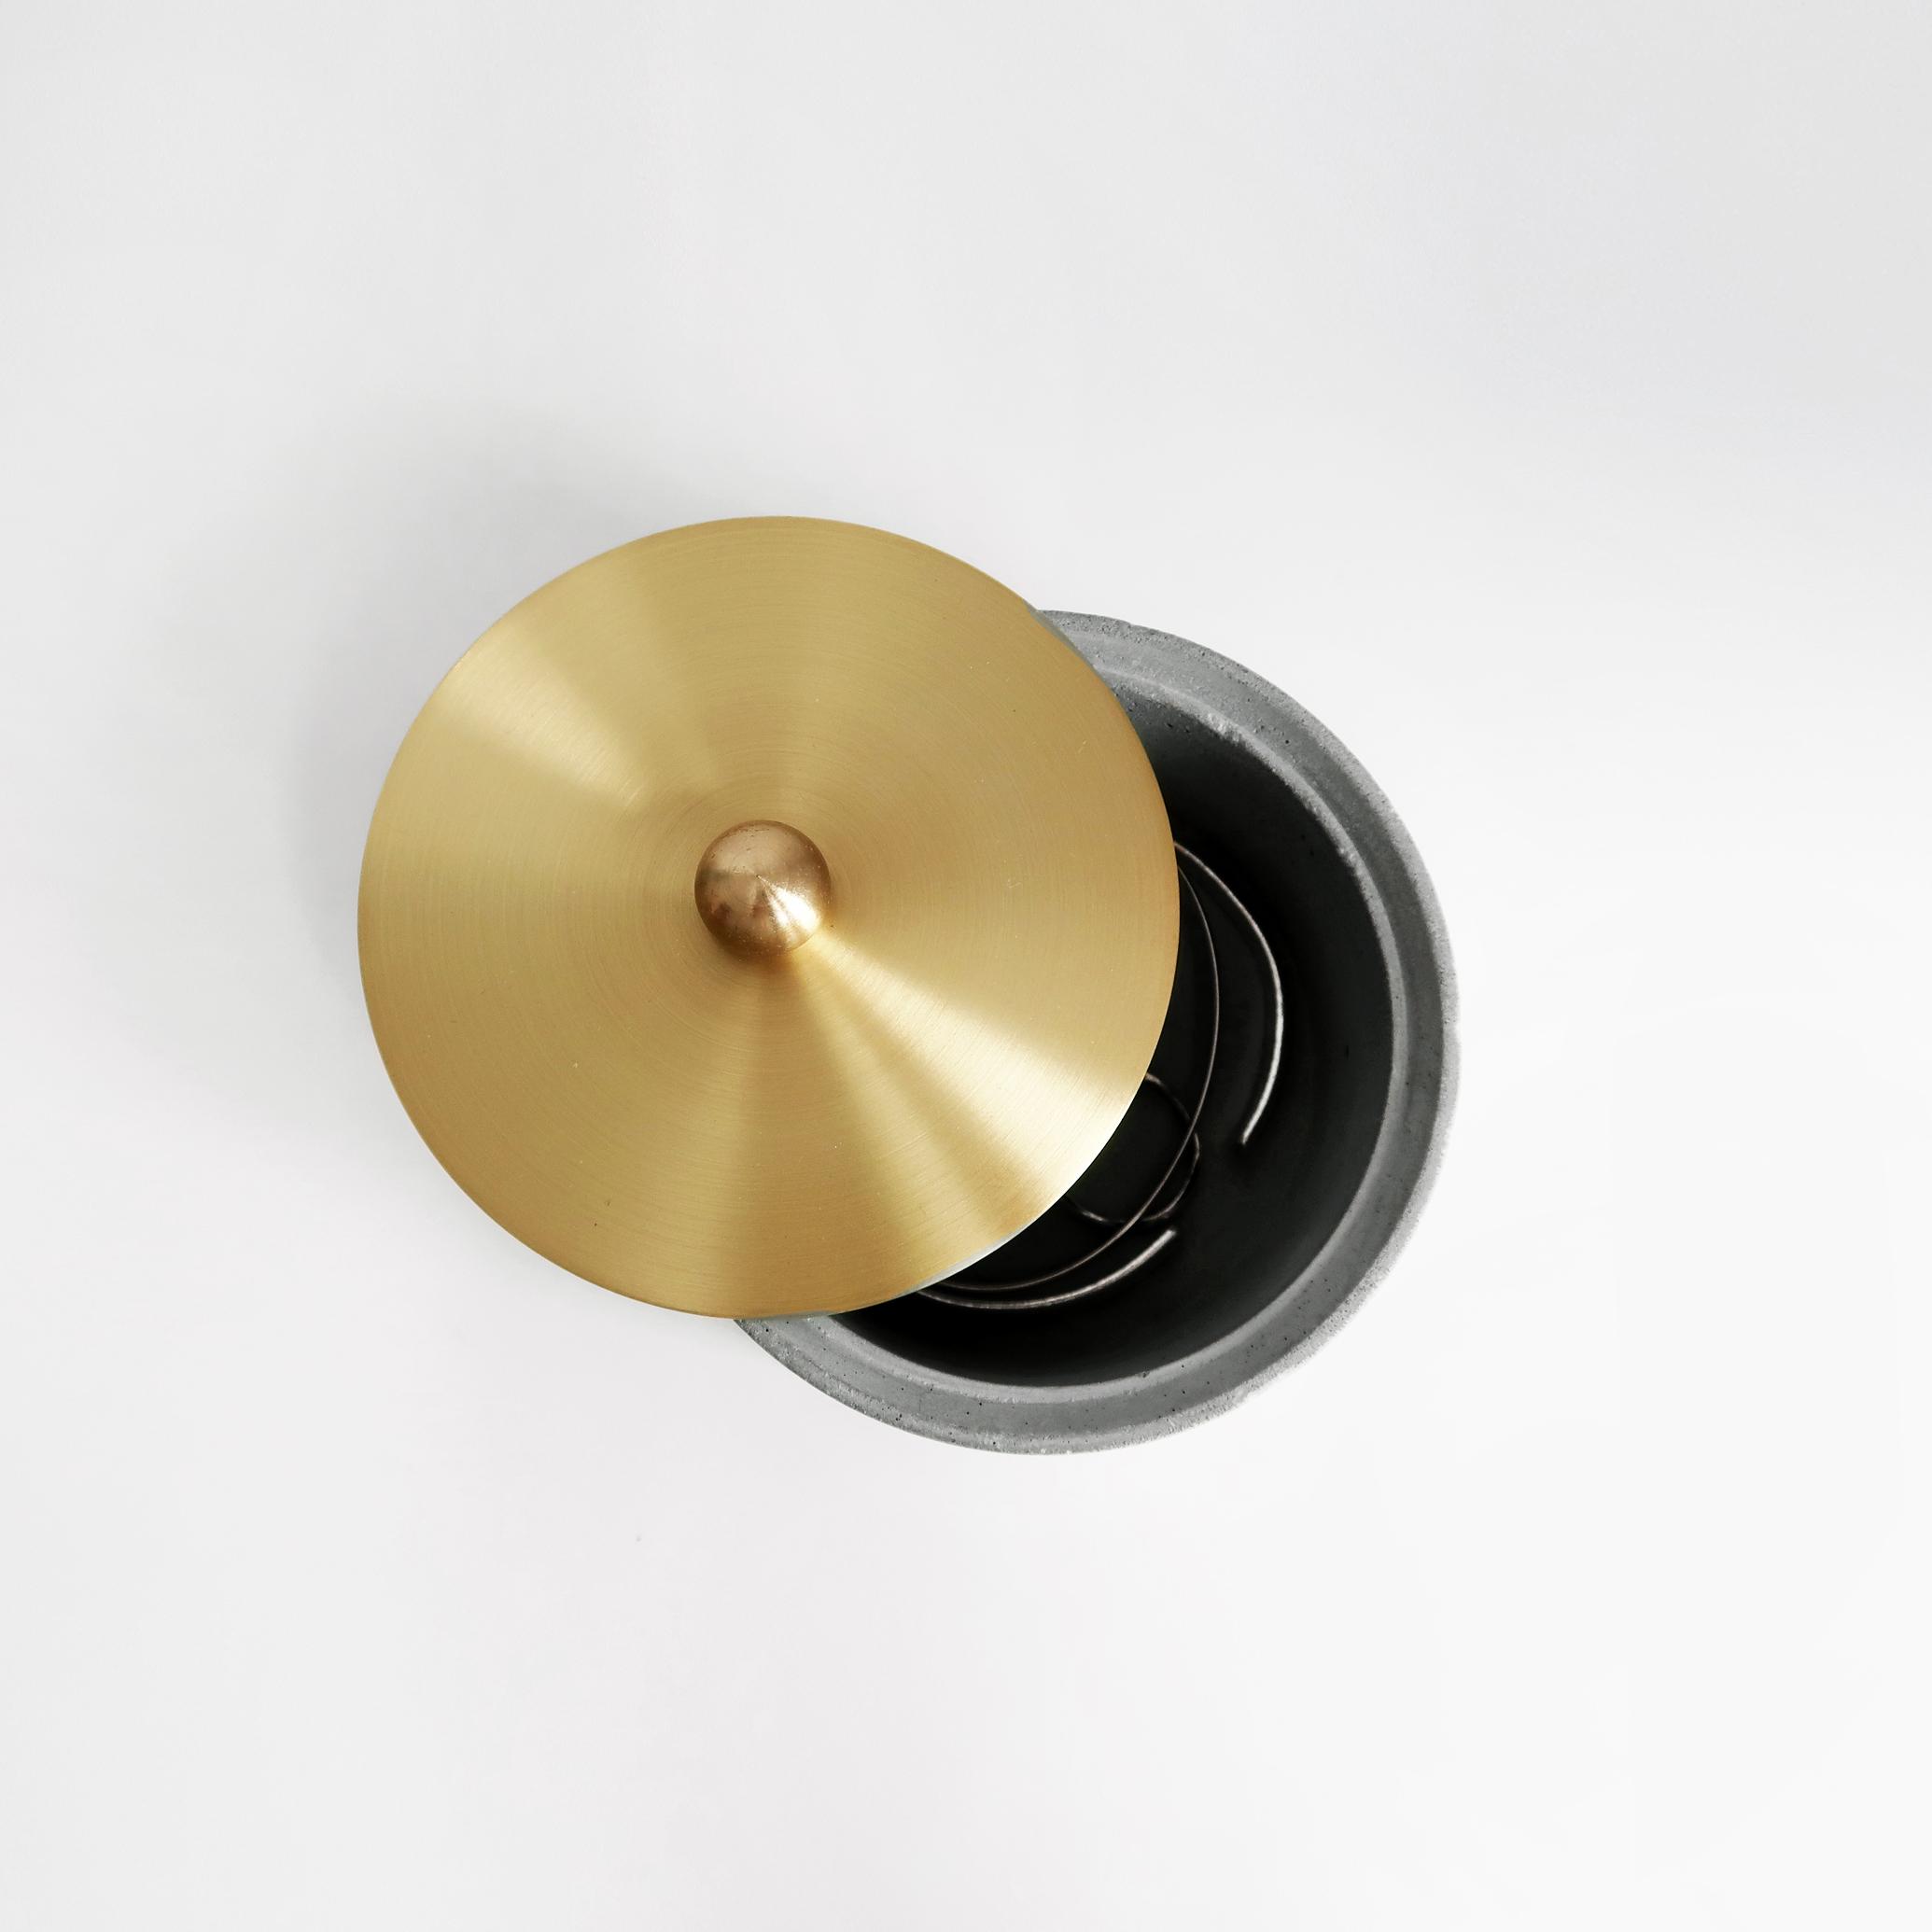 FULL MOON 懸月圓球黃銅蓋水泥收納容器・飾品盒・煙灰缸 / Concrete box with brass, Jewelry Storage, Ashtray